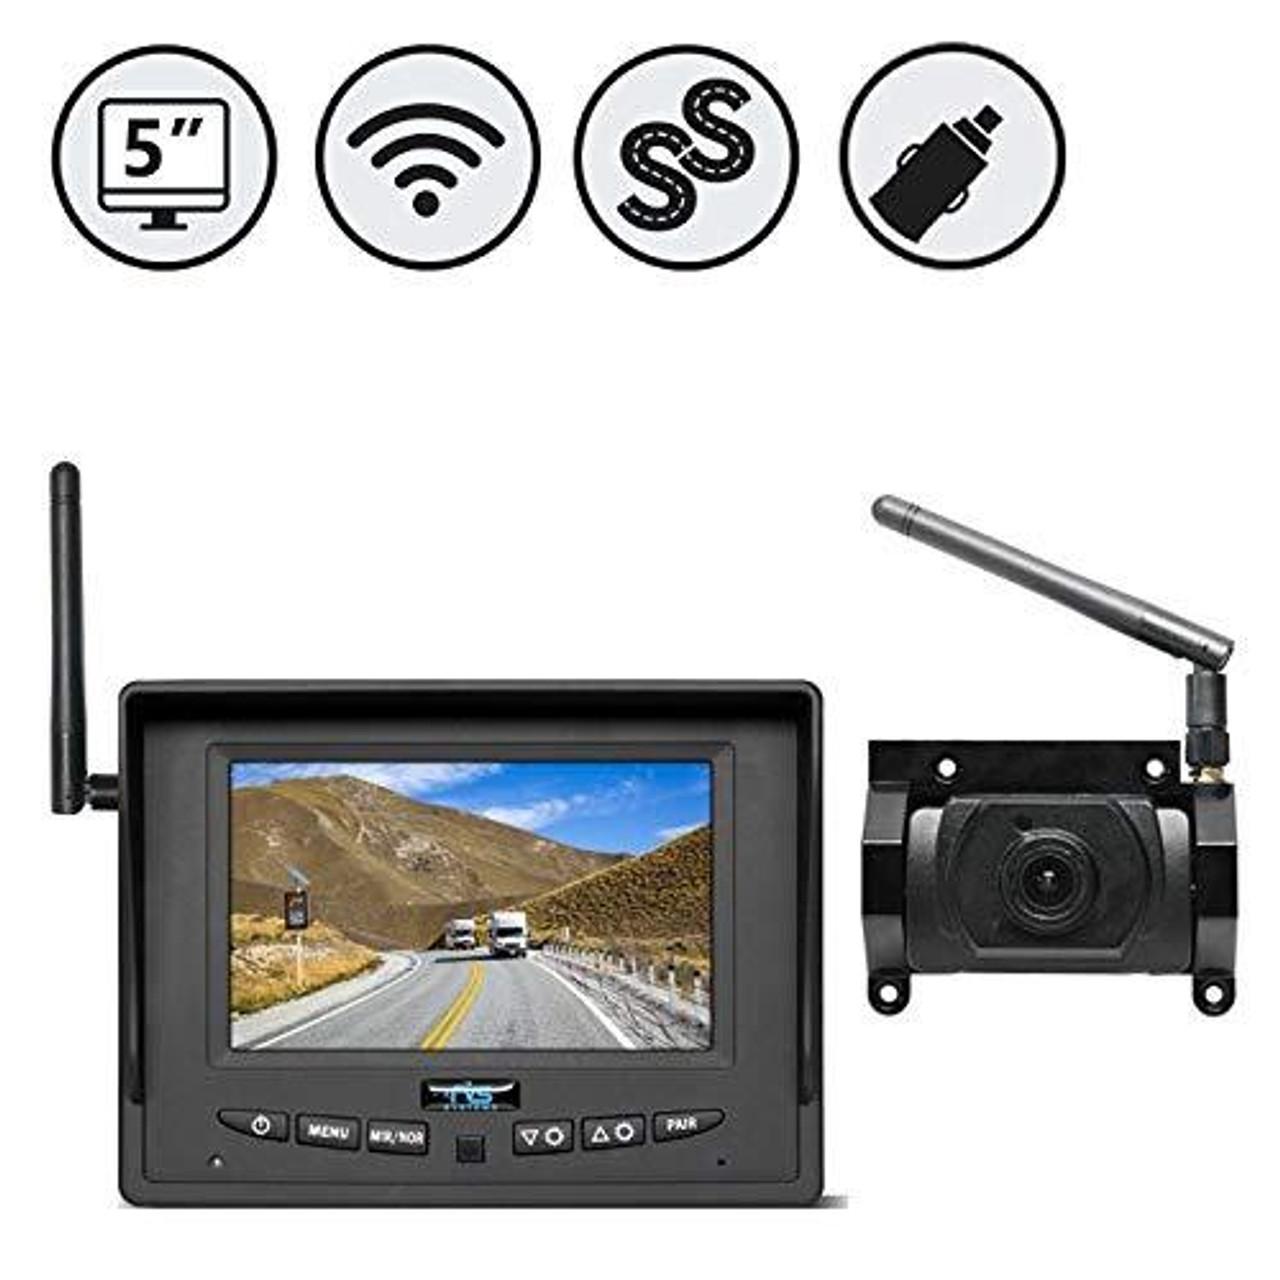 "Wireless 5"" Display, Wireless Camera (1 Ch.) for SimpleSight™ Prewire Kit"